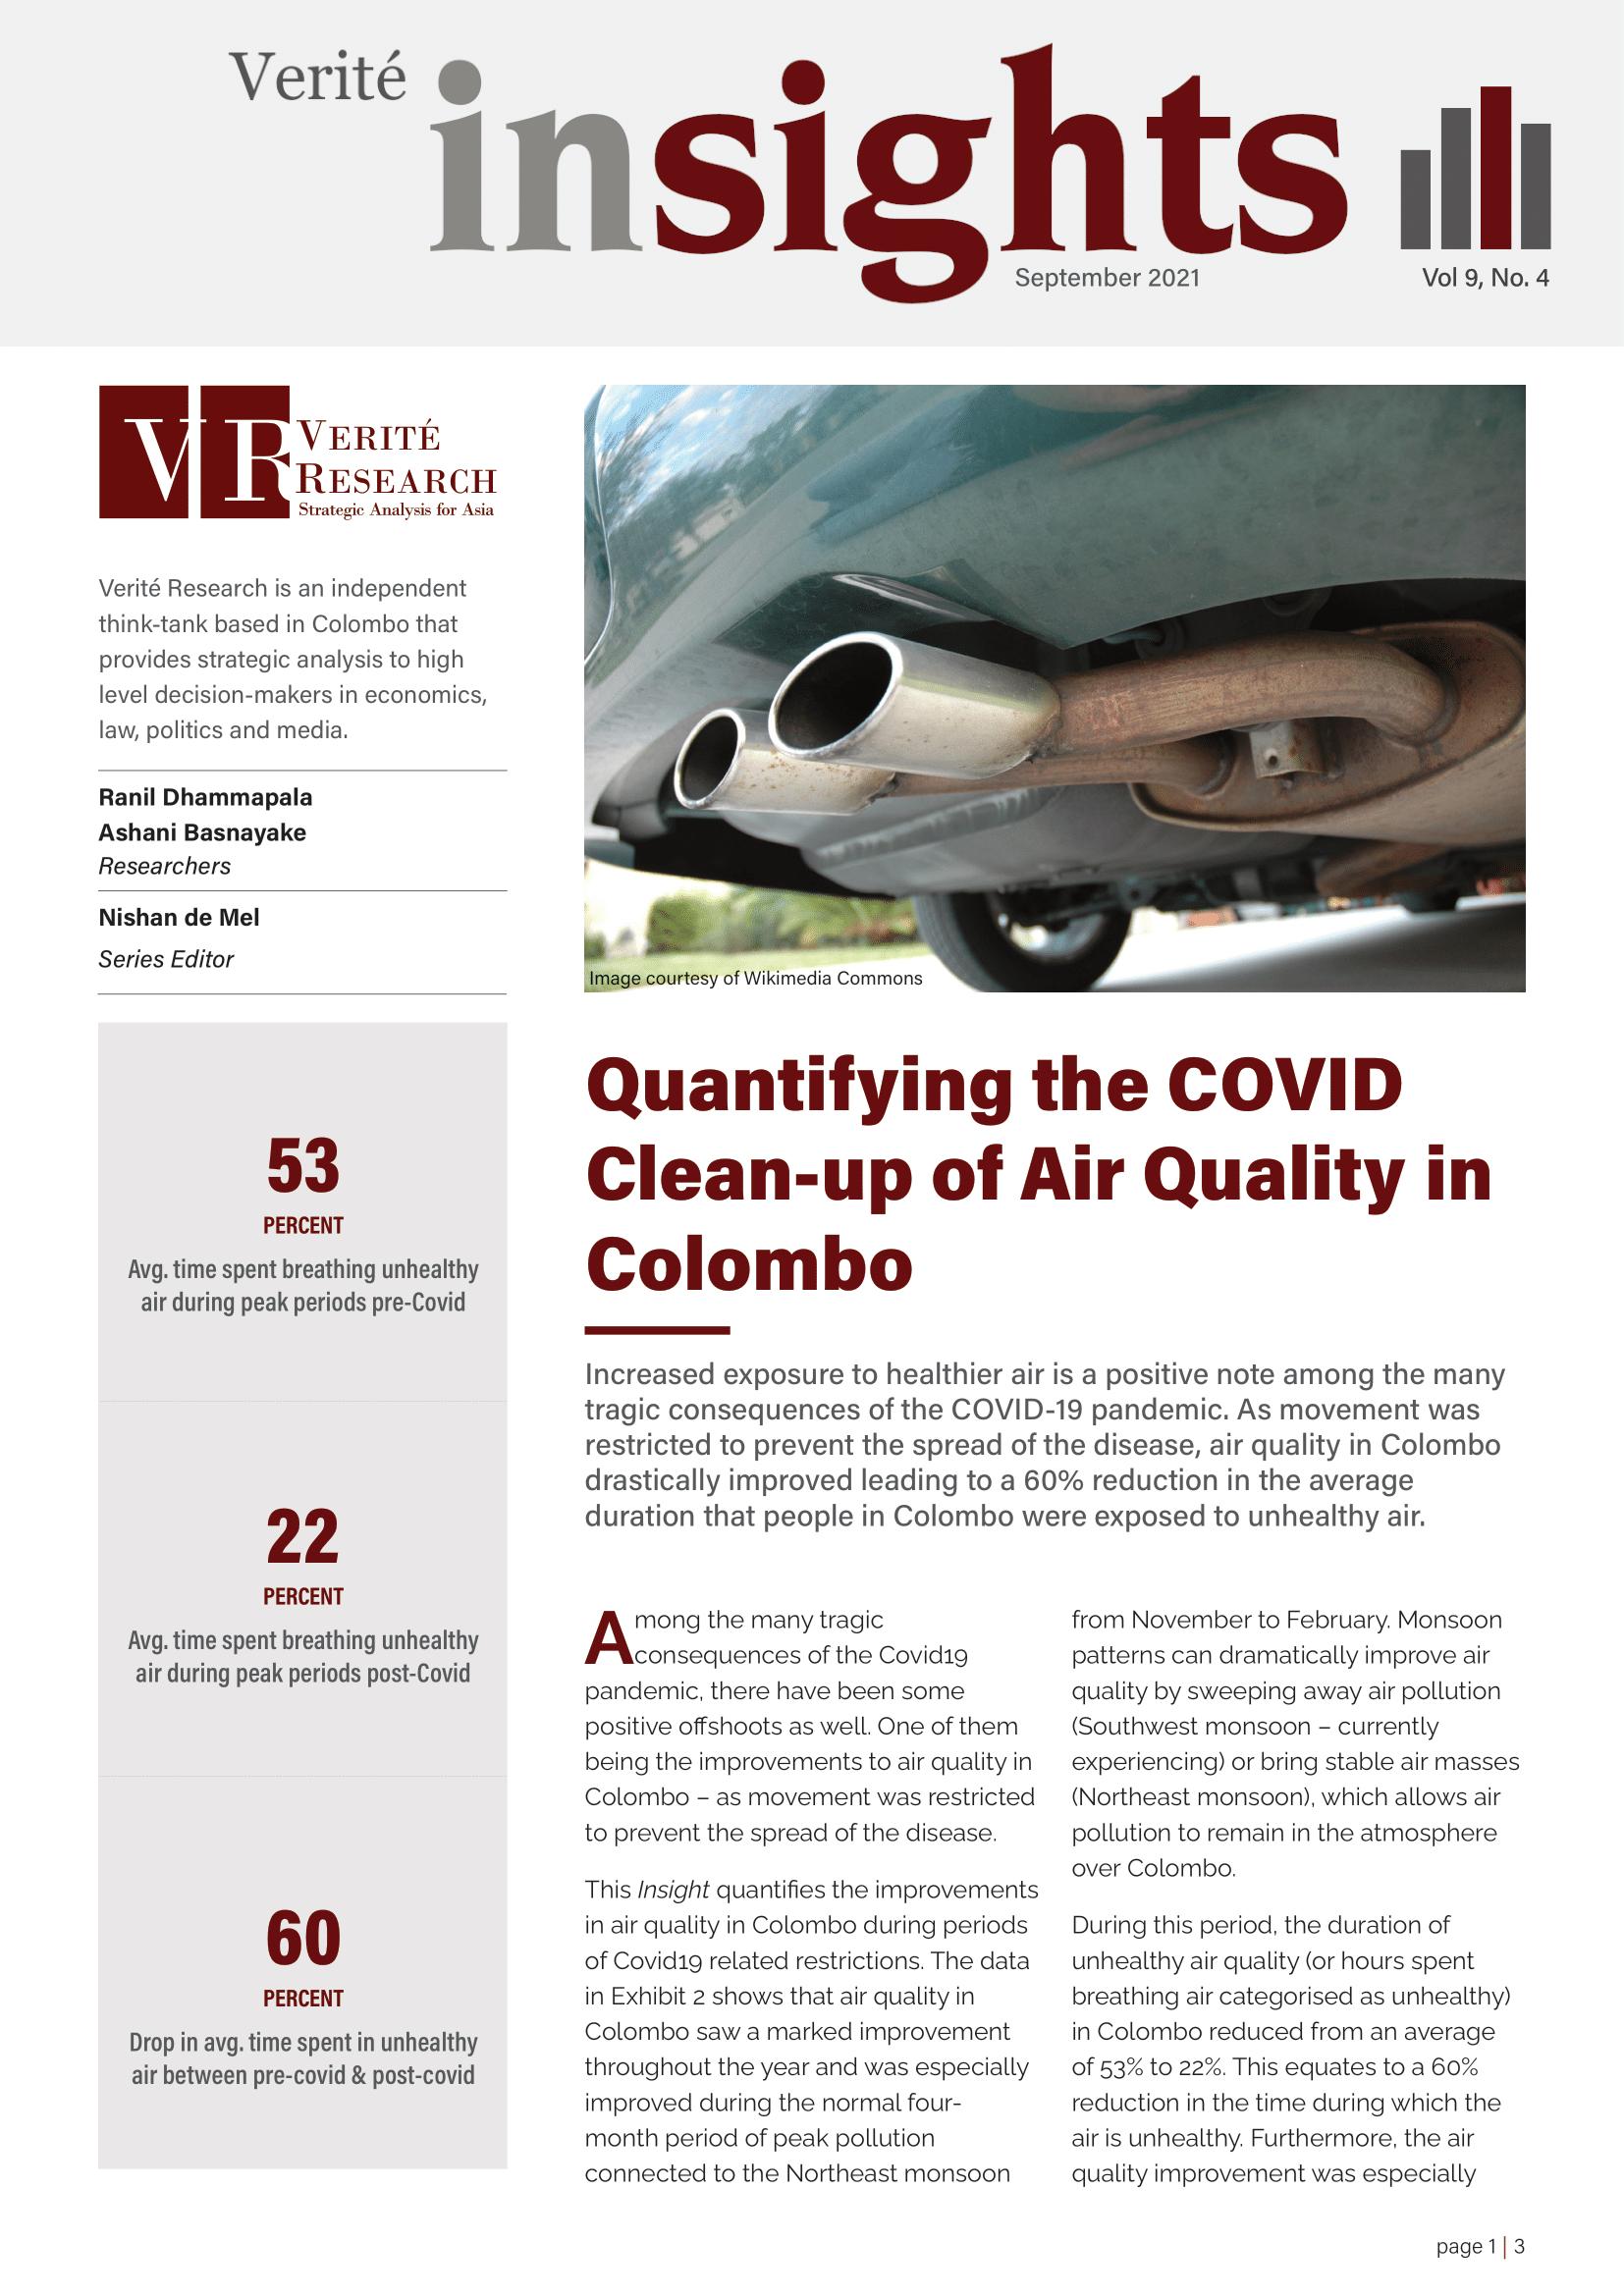 COVID air quality